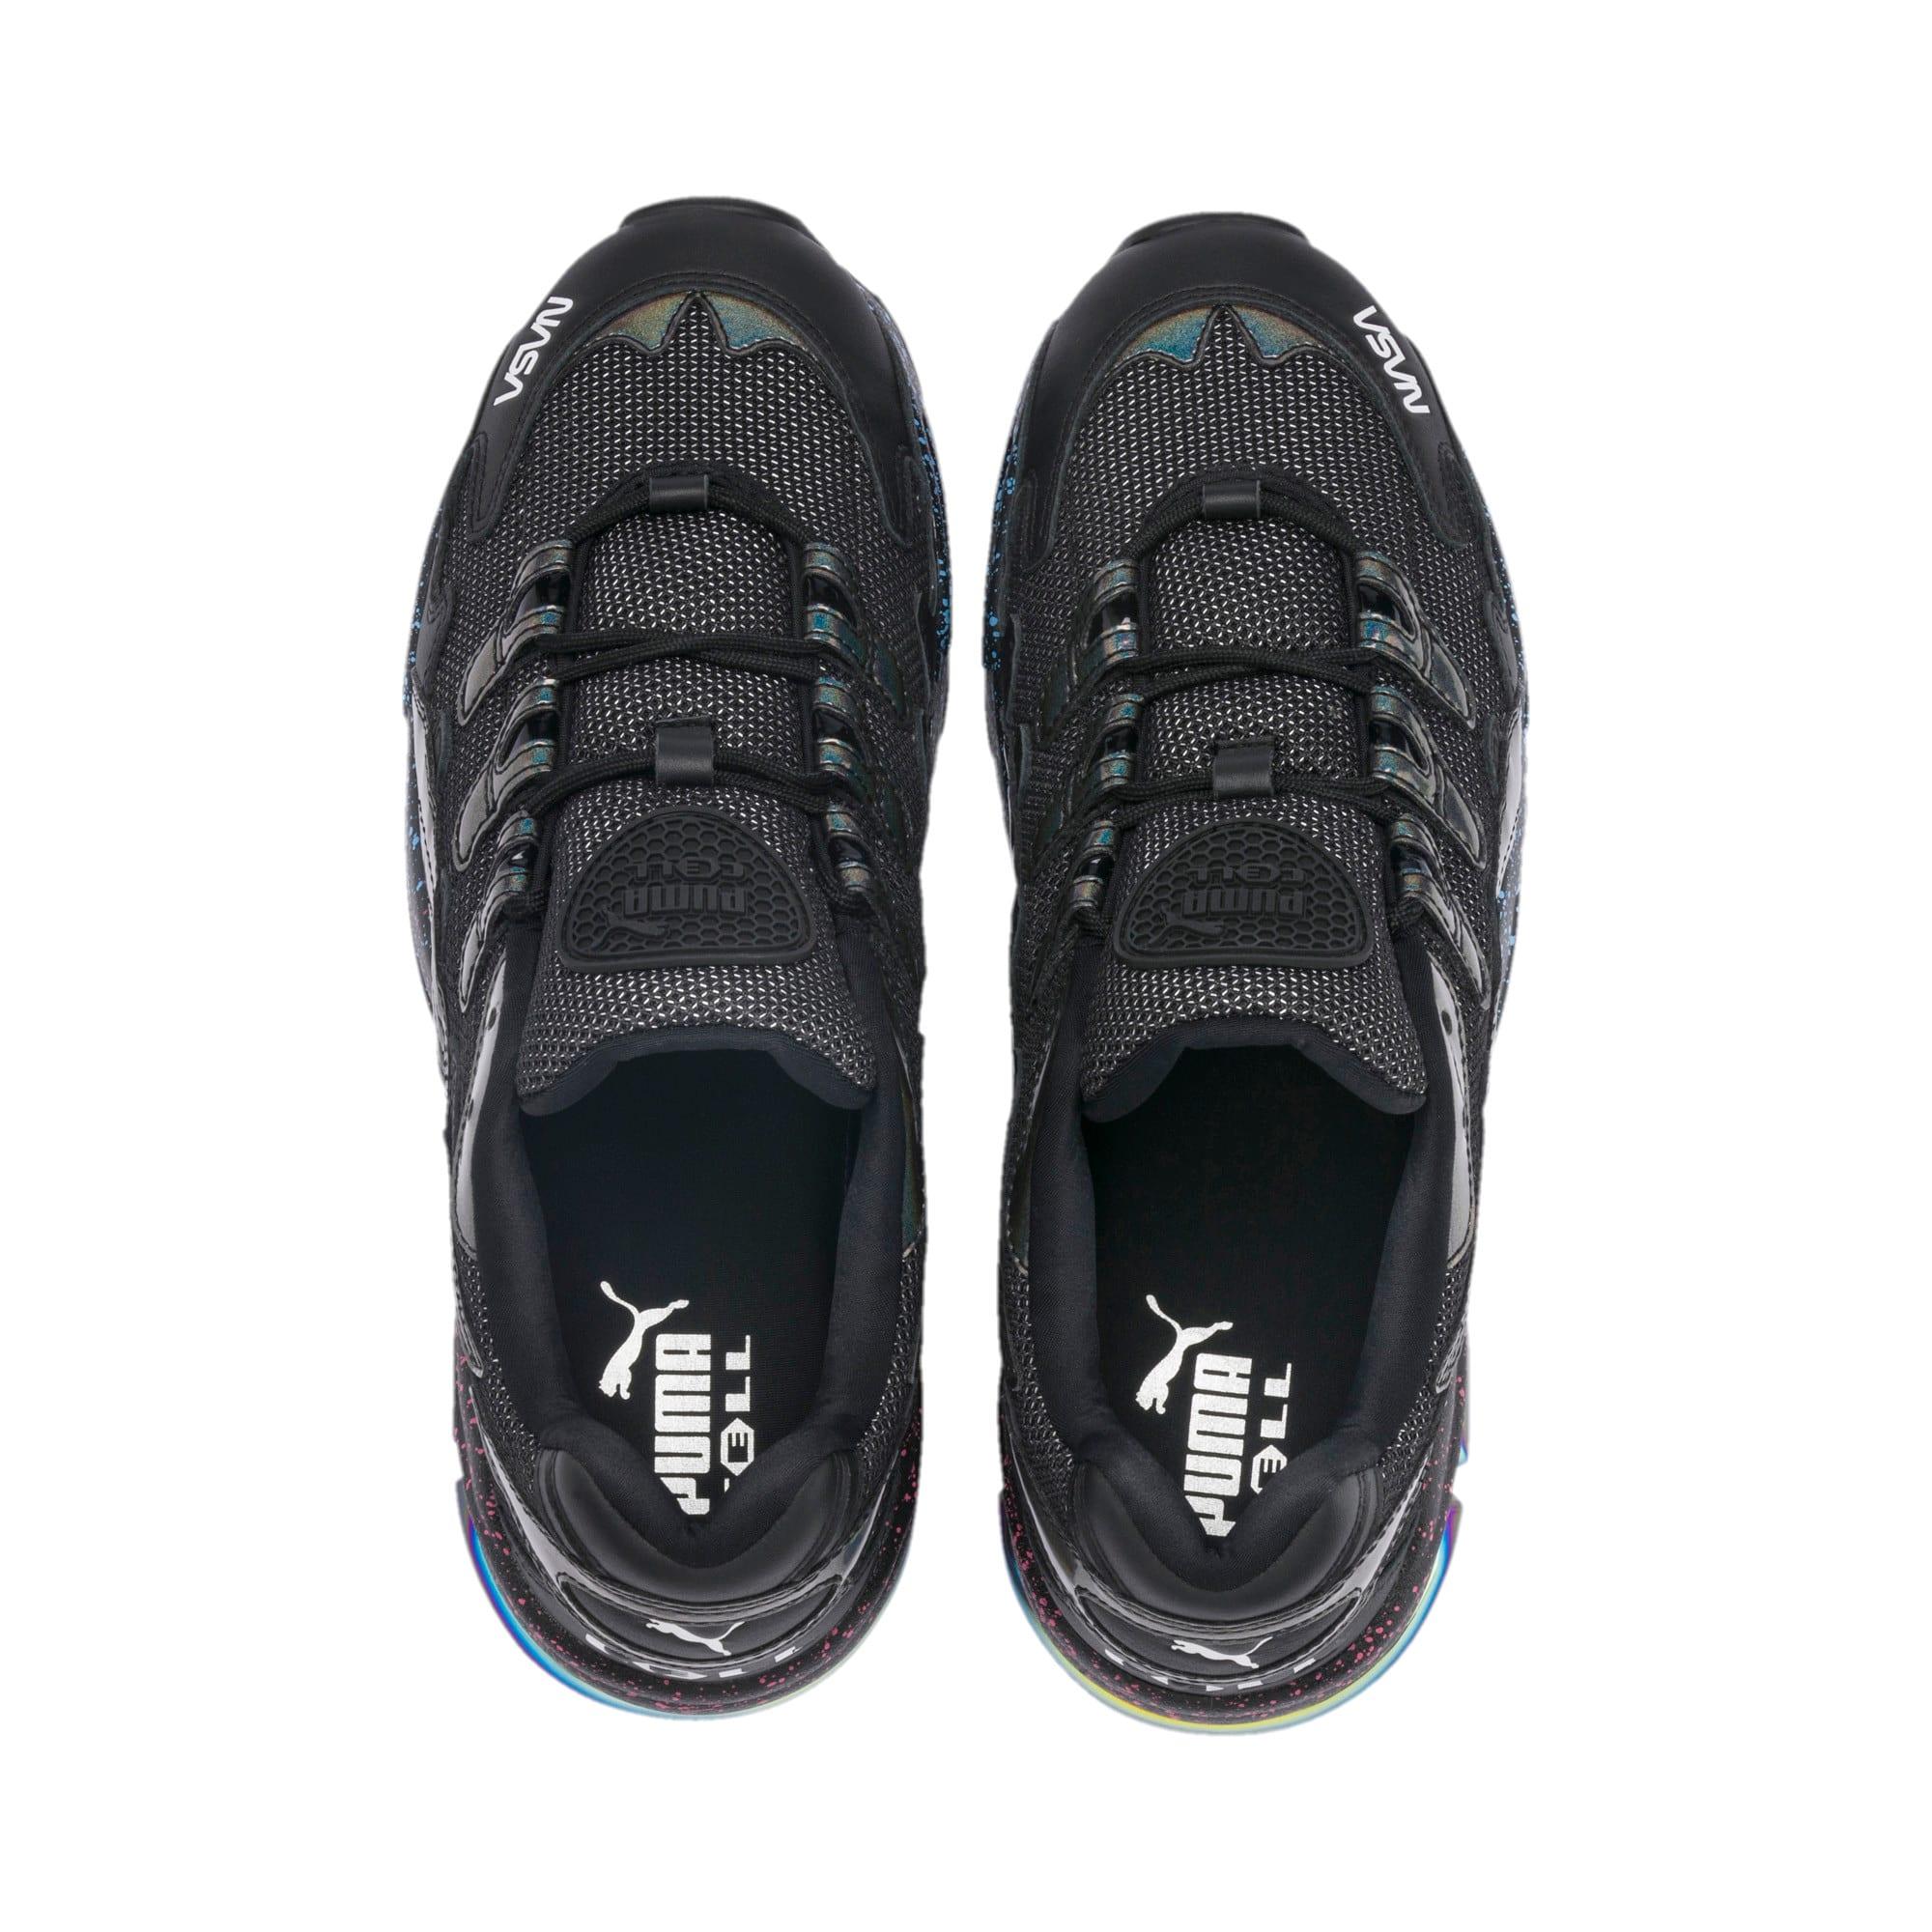 Thumbnail 6 of CELL Alien Space Explorer Sneaker, Puma Black-Puma Black, medium